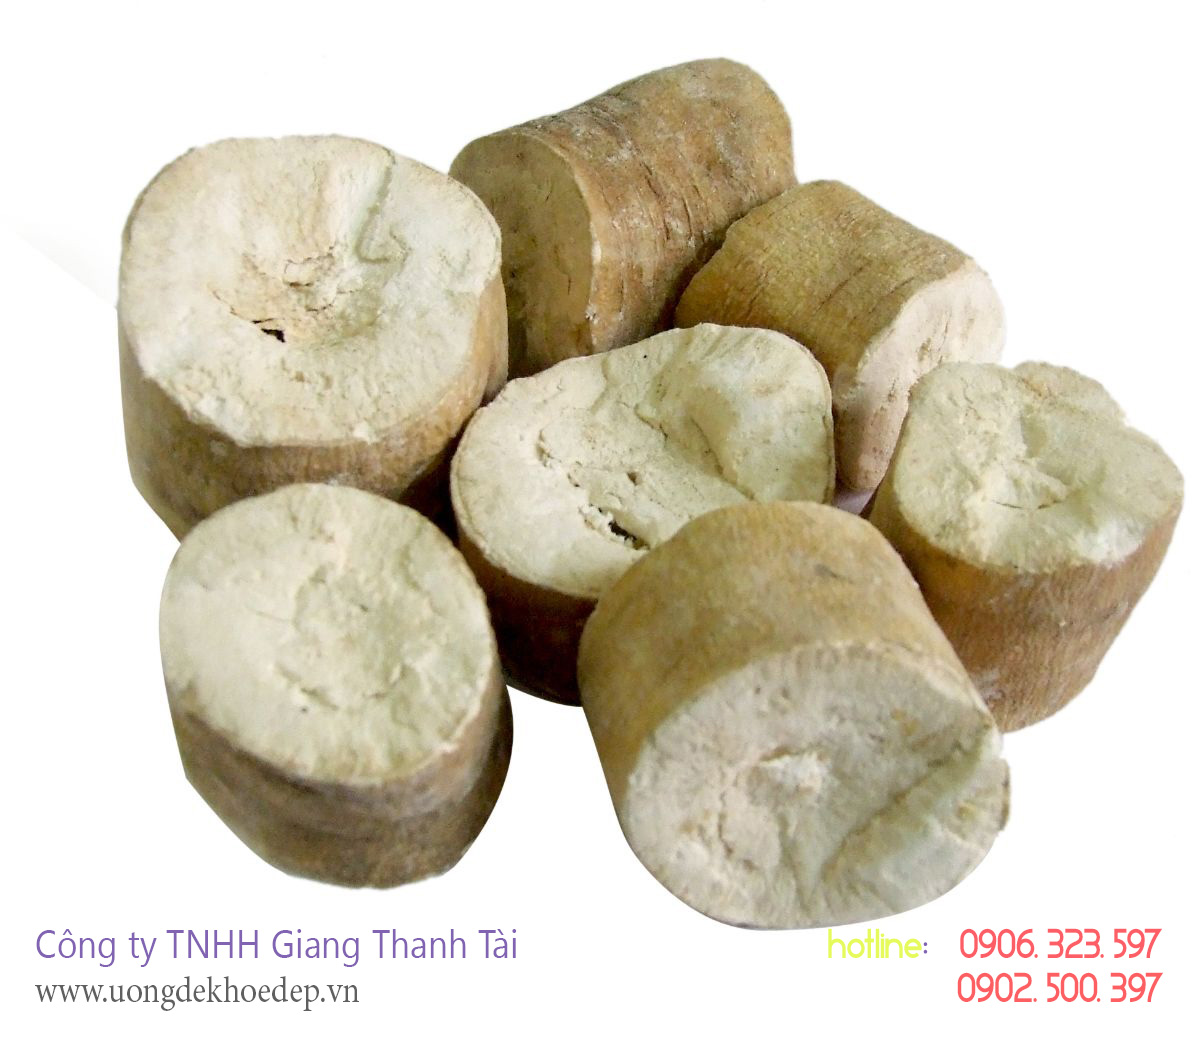 bán bột sắn dây